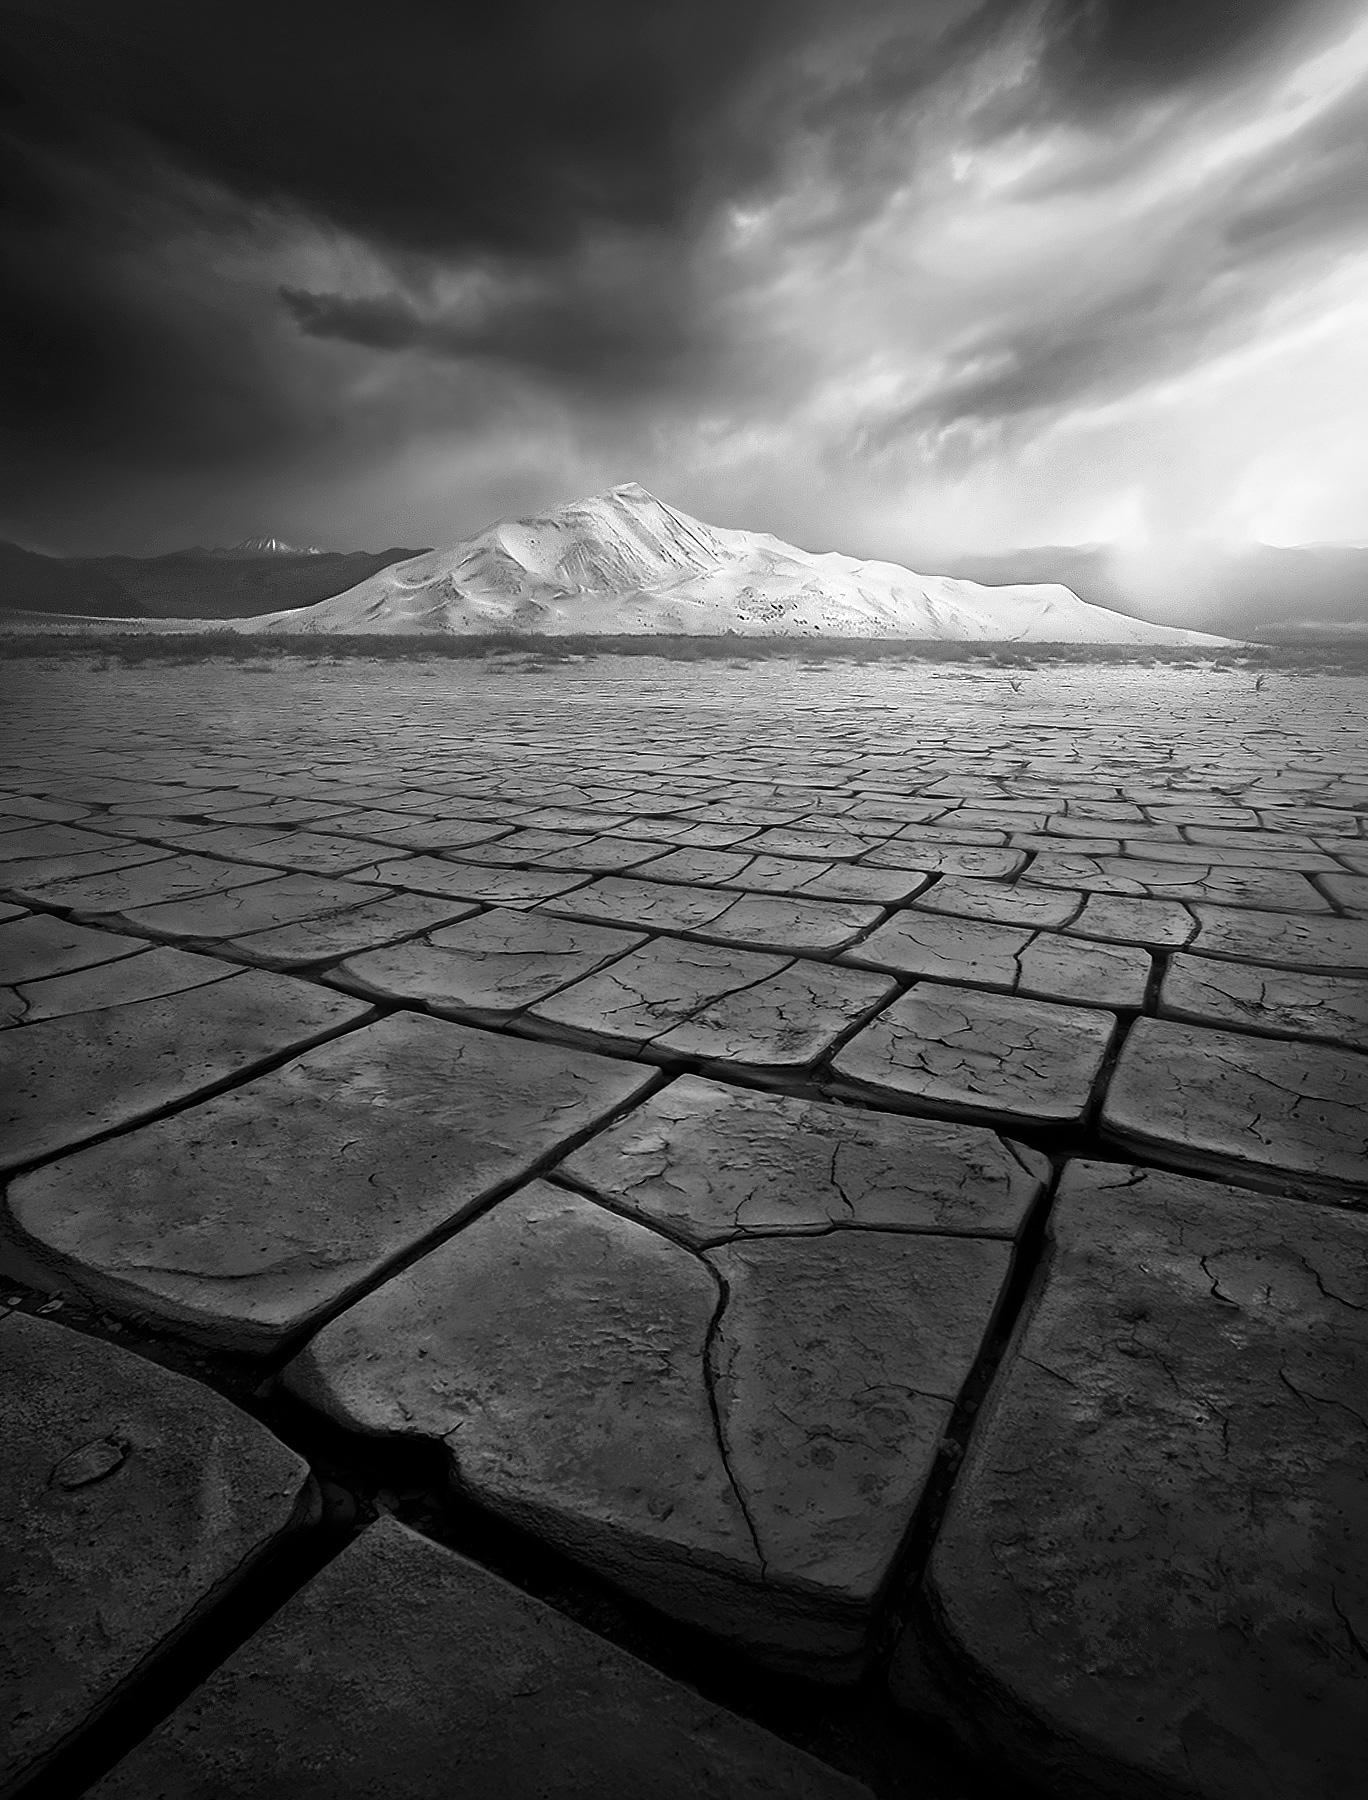 Amazingly uniform cracks on this dried playa next to Death Valley's Eureka Dunes under dramatic skies.